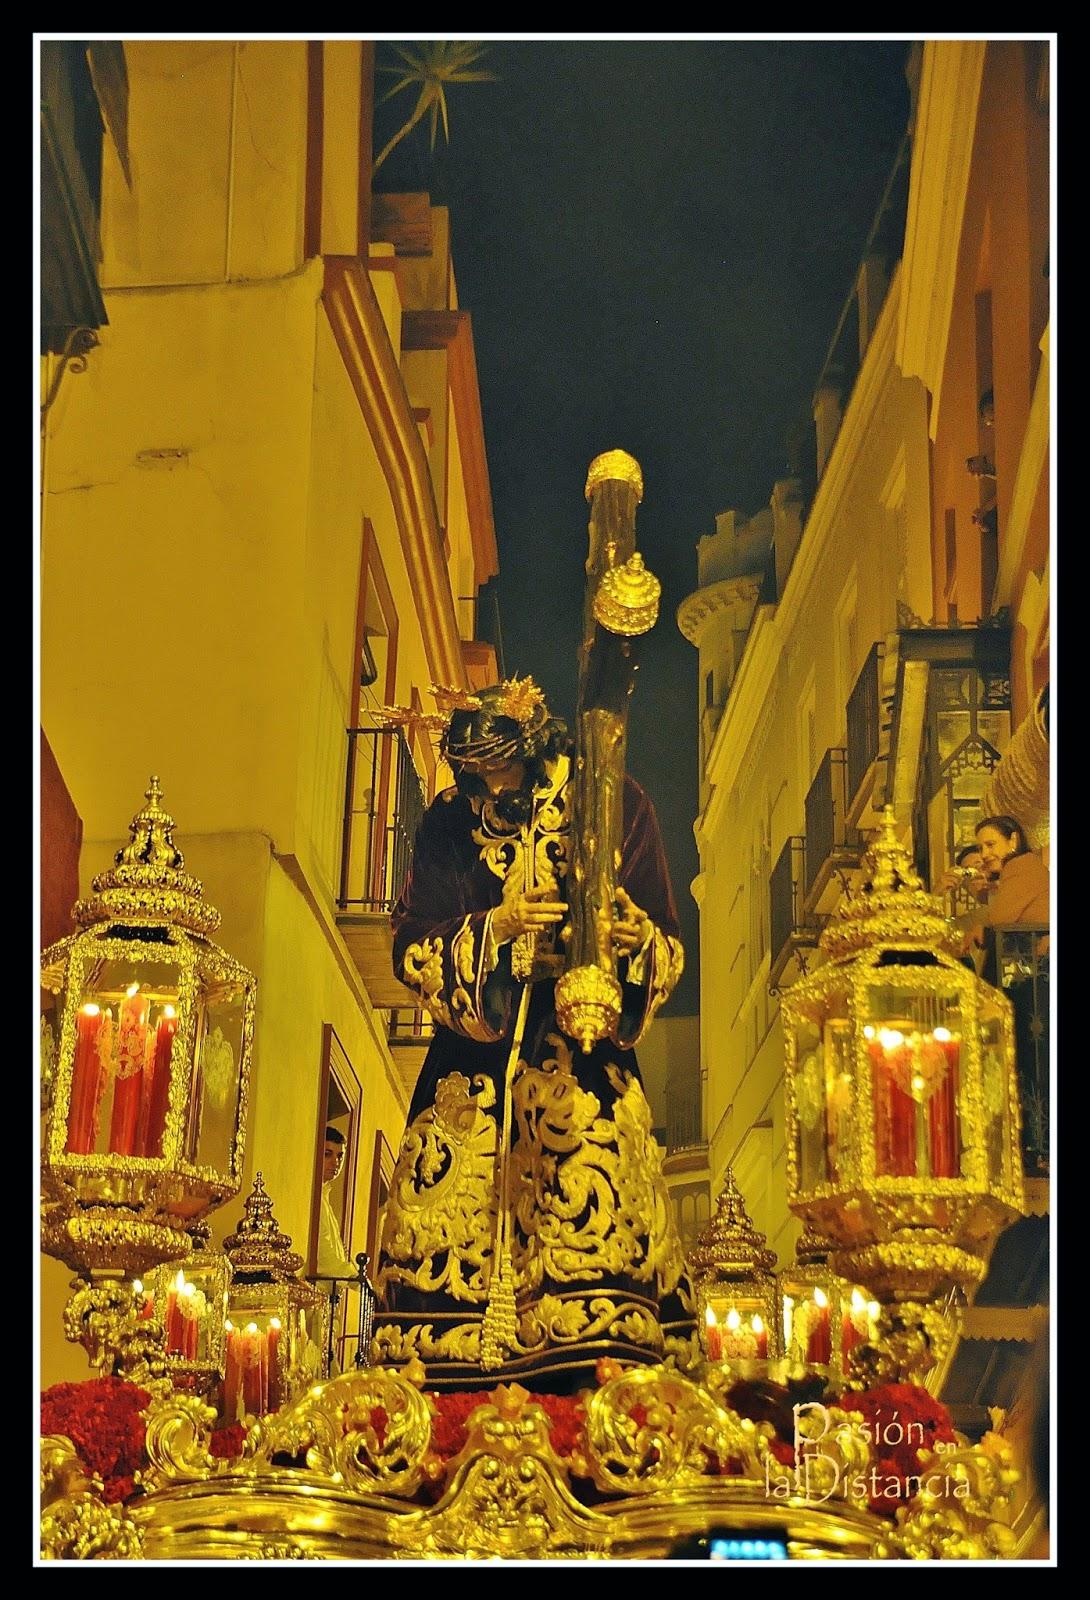 San Roque Semana Santa Sevilla 2014 Domingo de Ramos Boteros